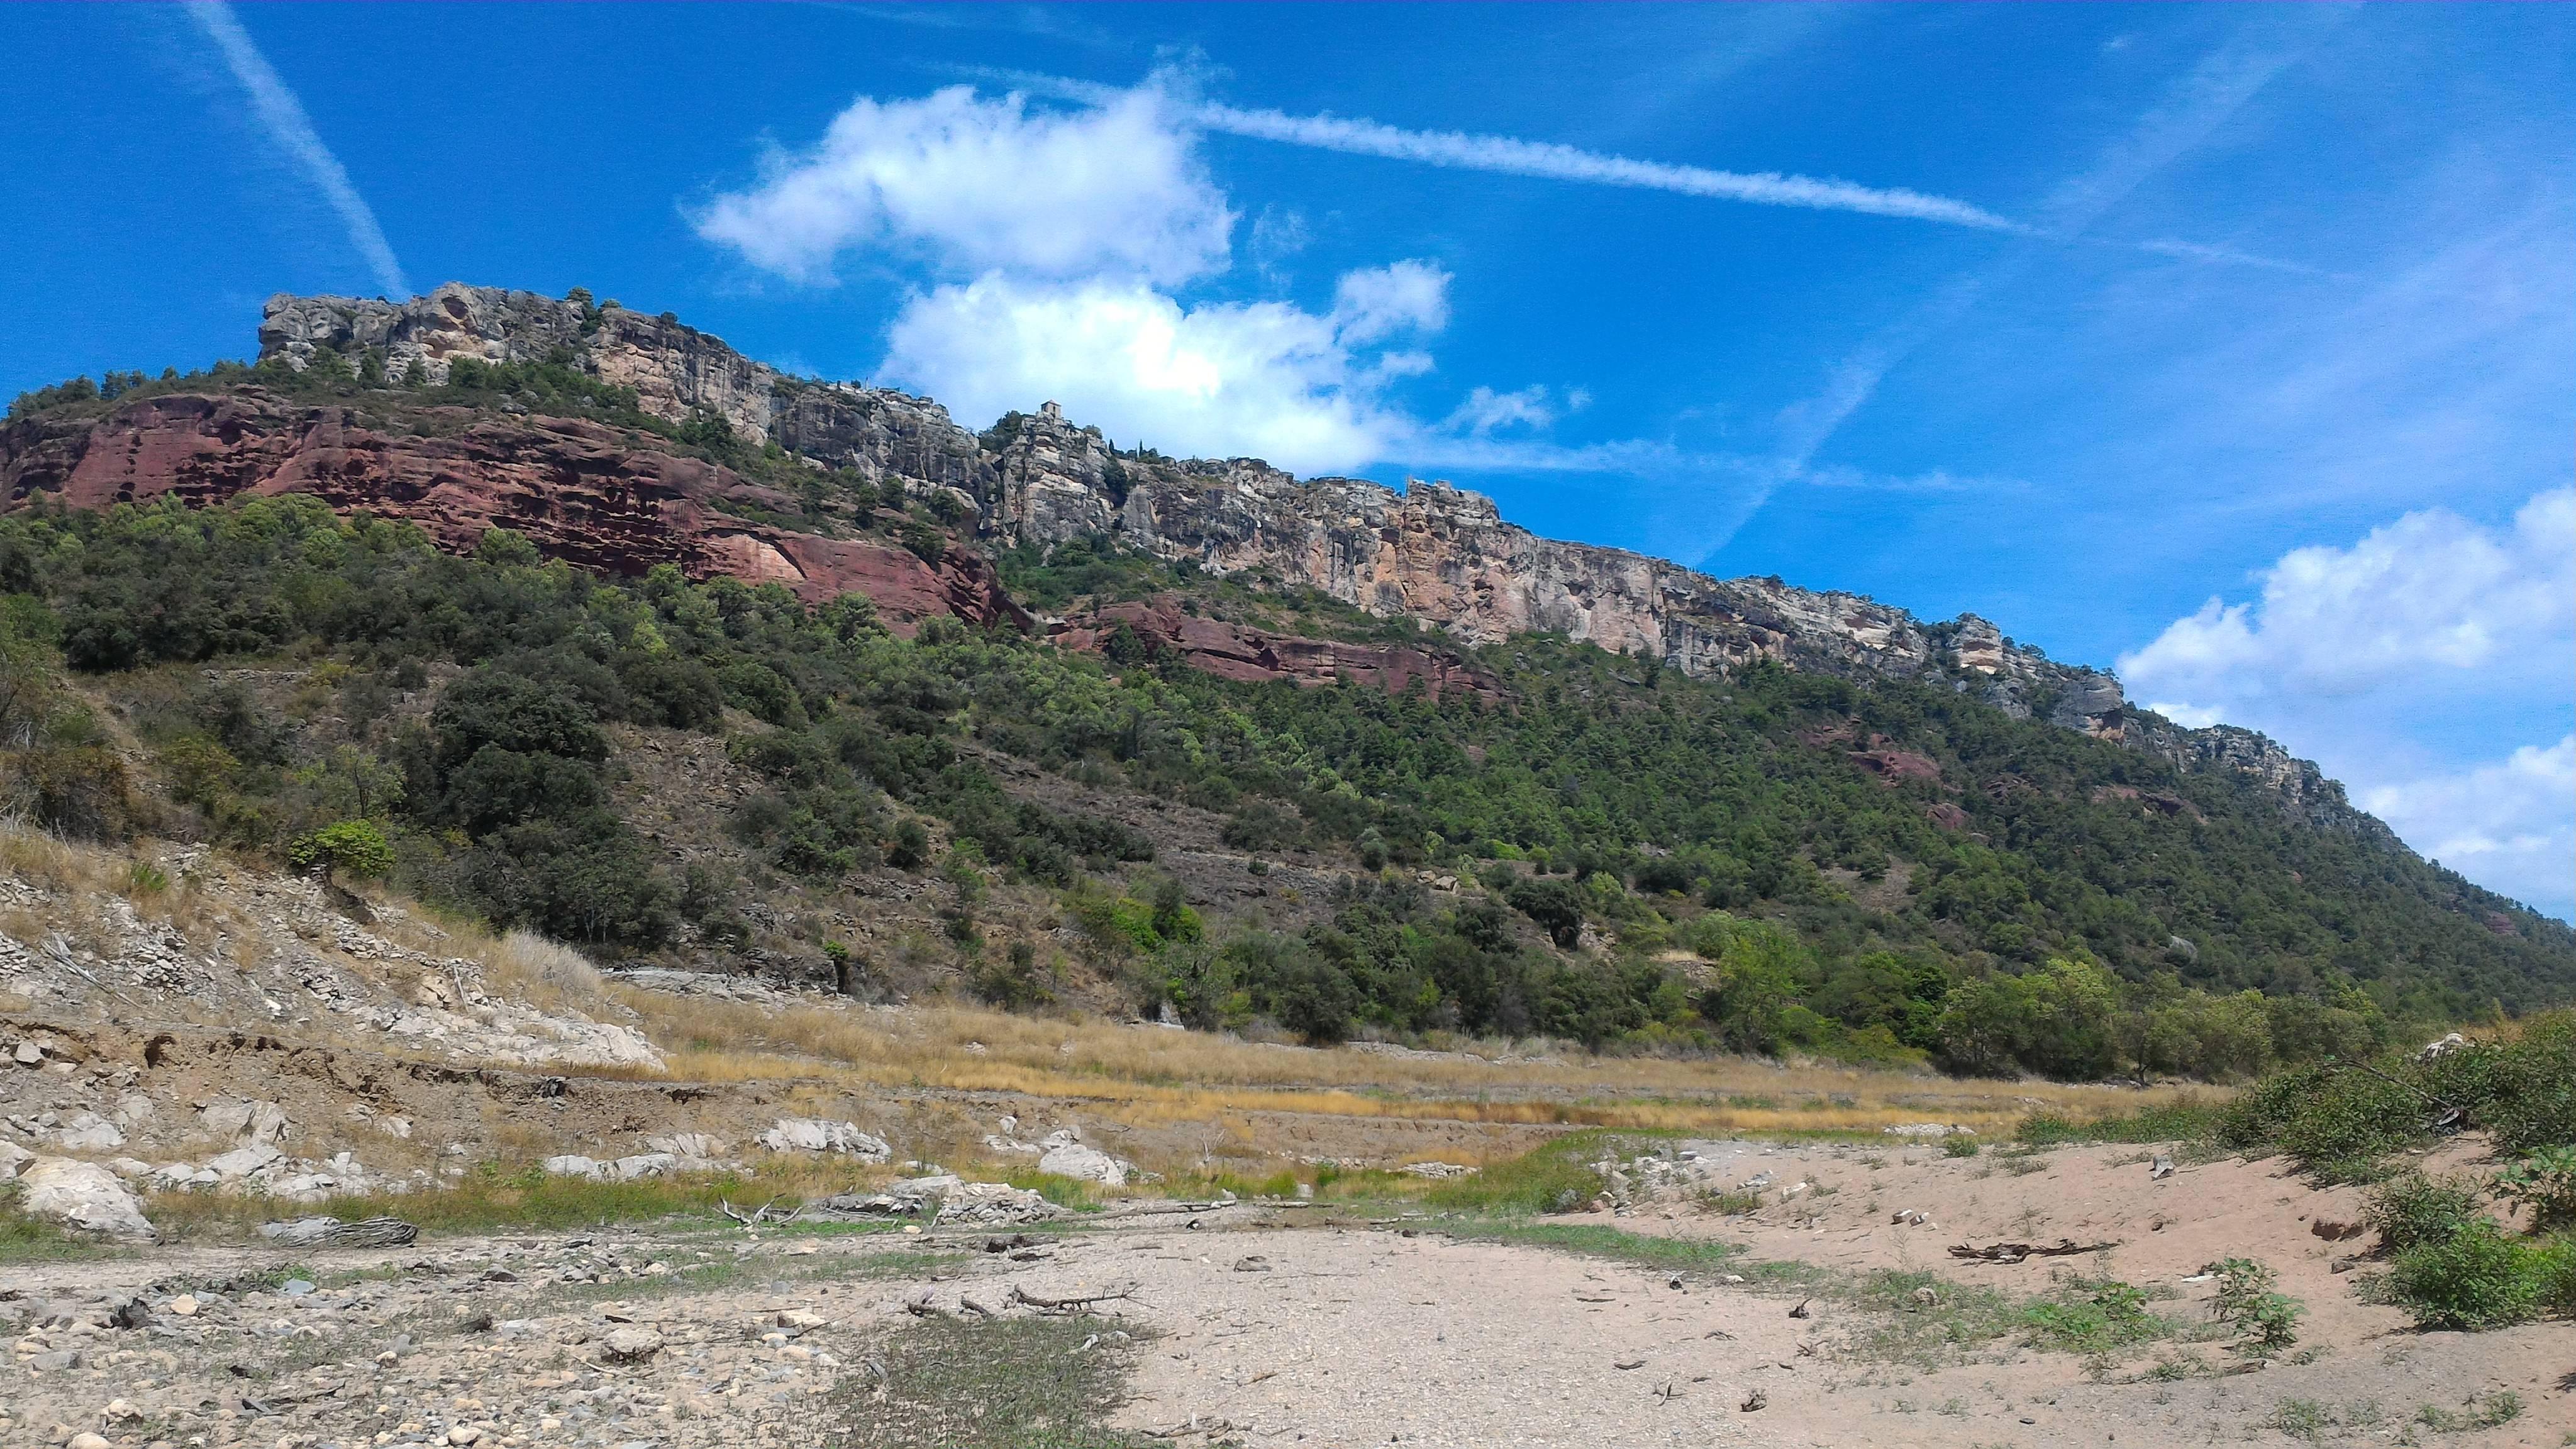 Photo 3: Le Barrage de la Siurana